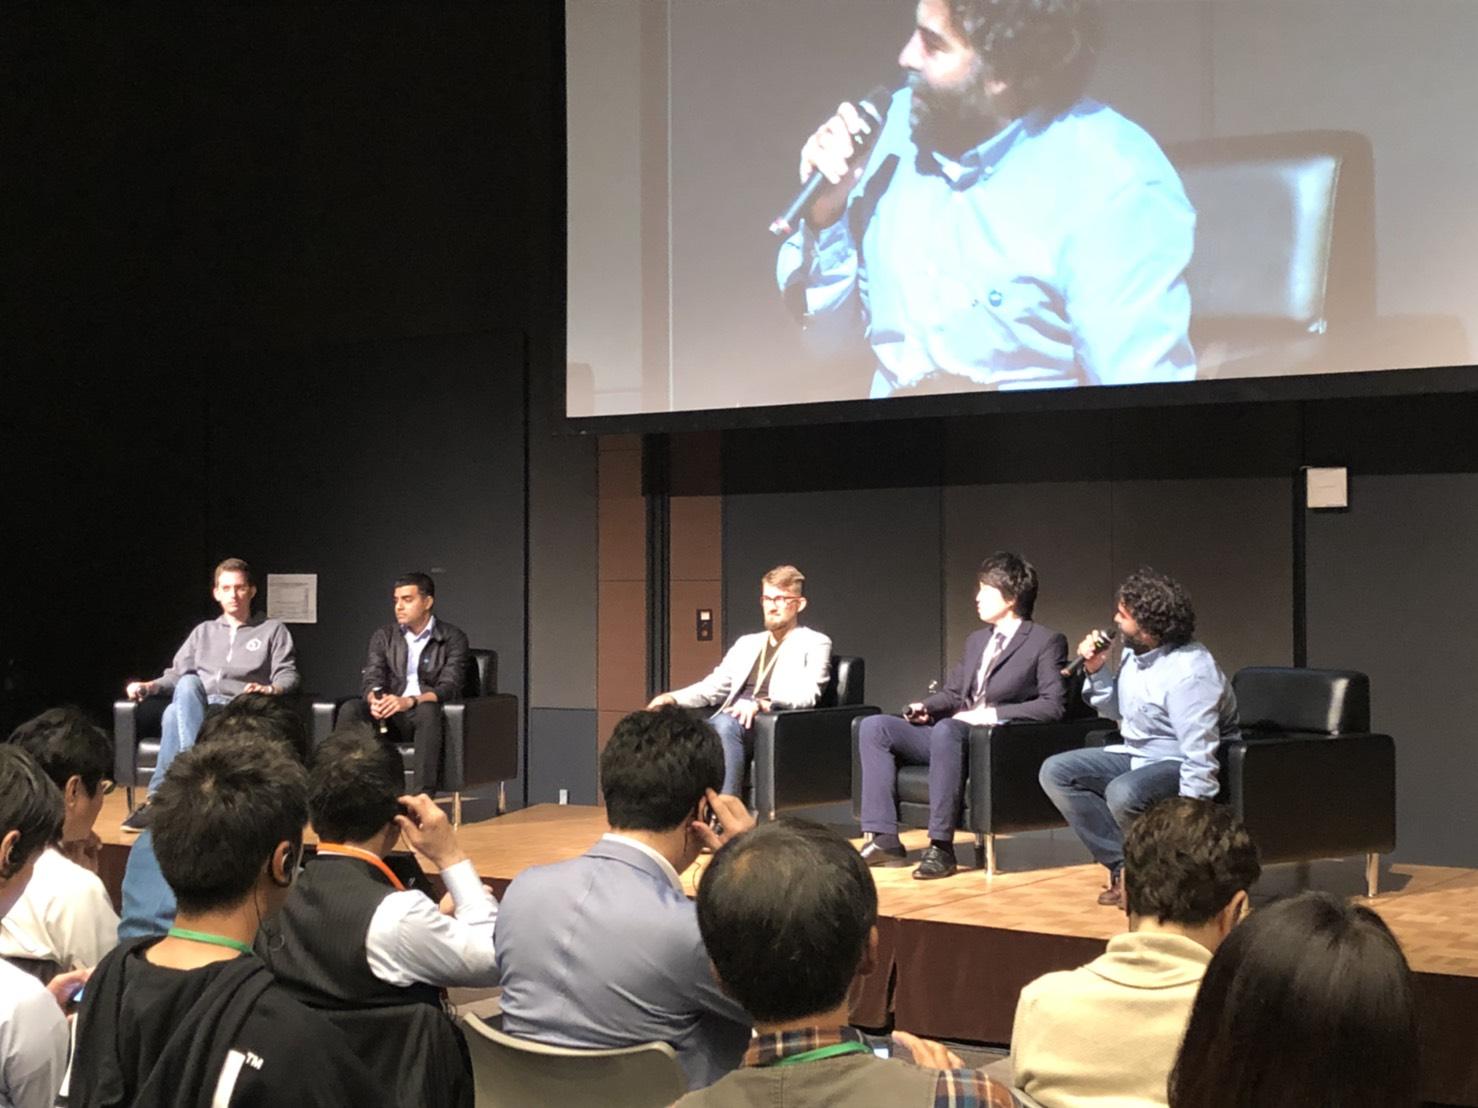 【RSK Blockchain Conferenceレポート】パネルディスカッション「私たちの世界を変えるアプリケーション」